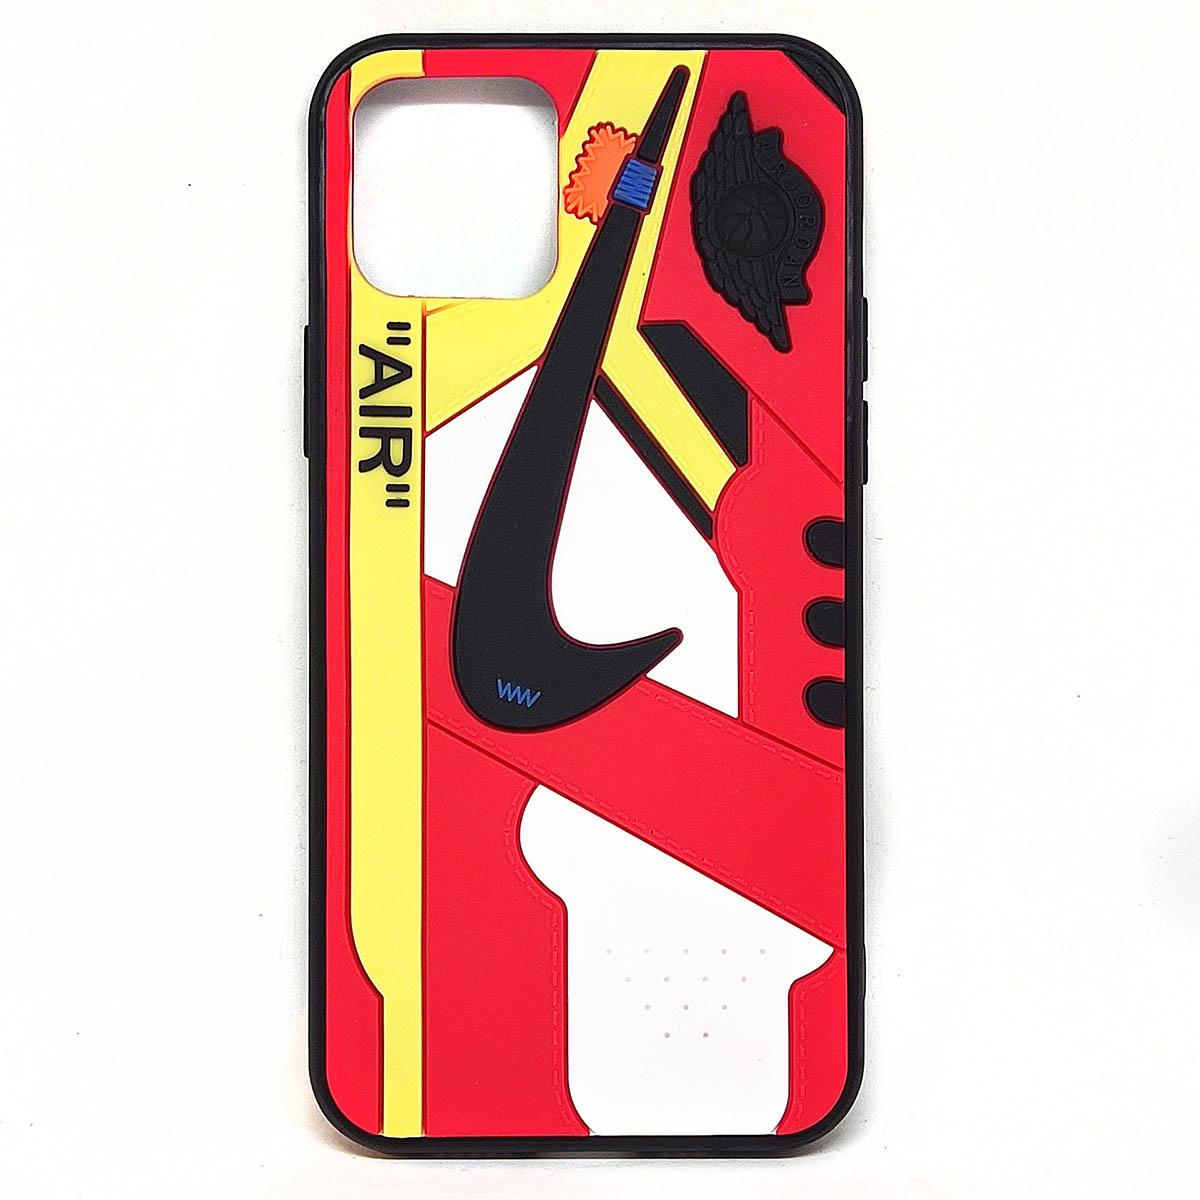 Cover AJ1 Chicago Air rossa per iphone 11, 11 pro, 11 pro max | Blacksheep Store